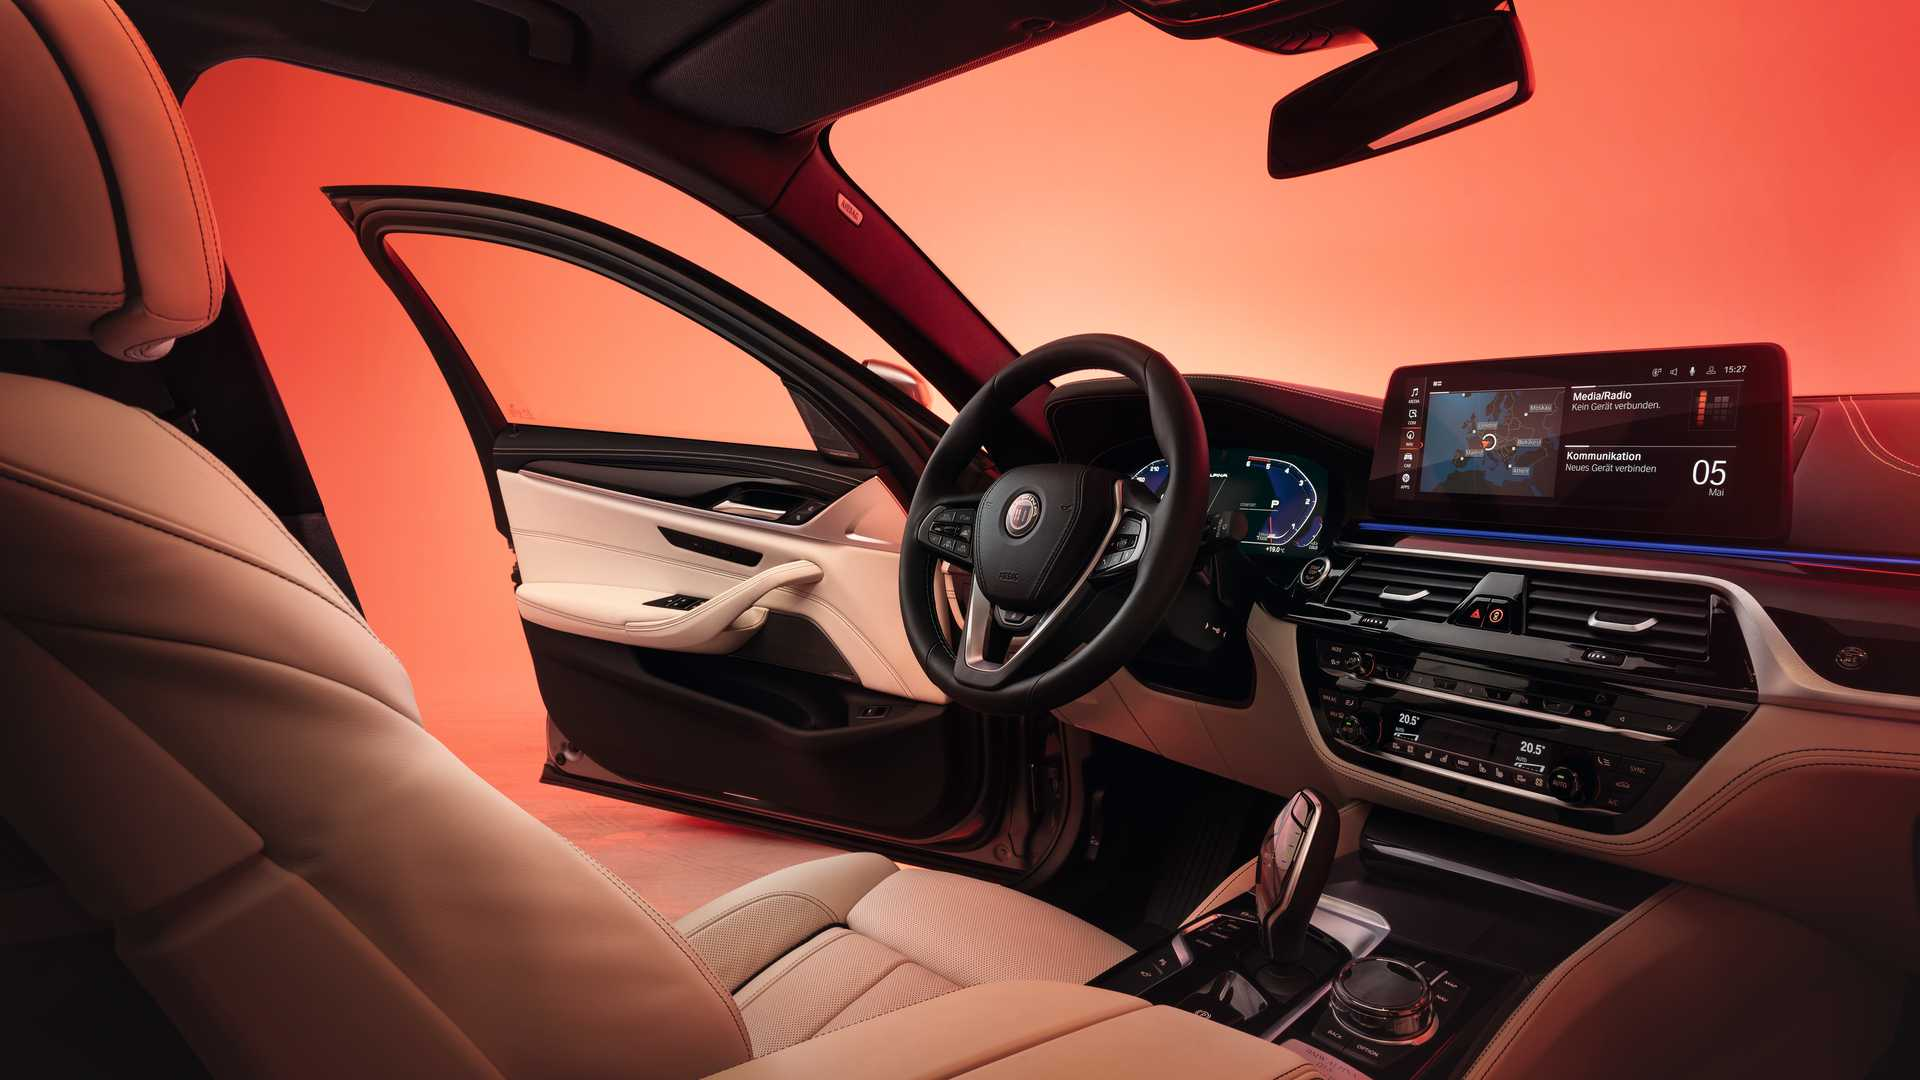 BMW Alpina D5 S (2020)